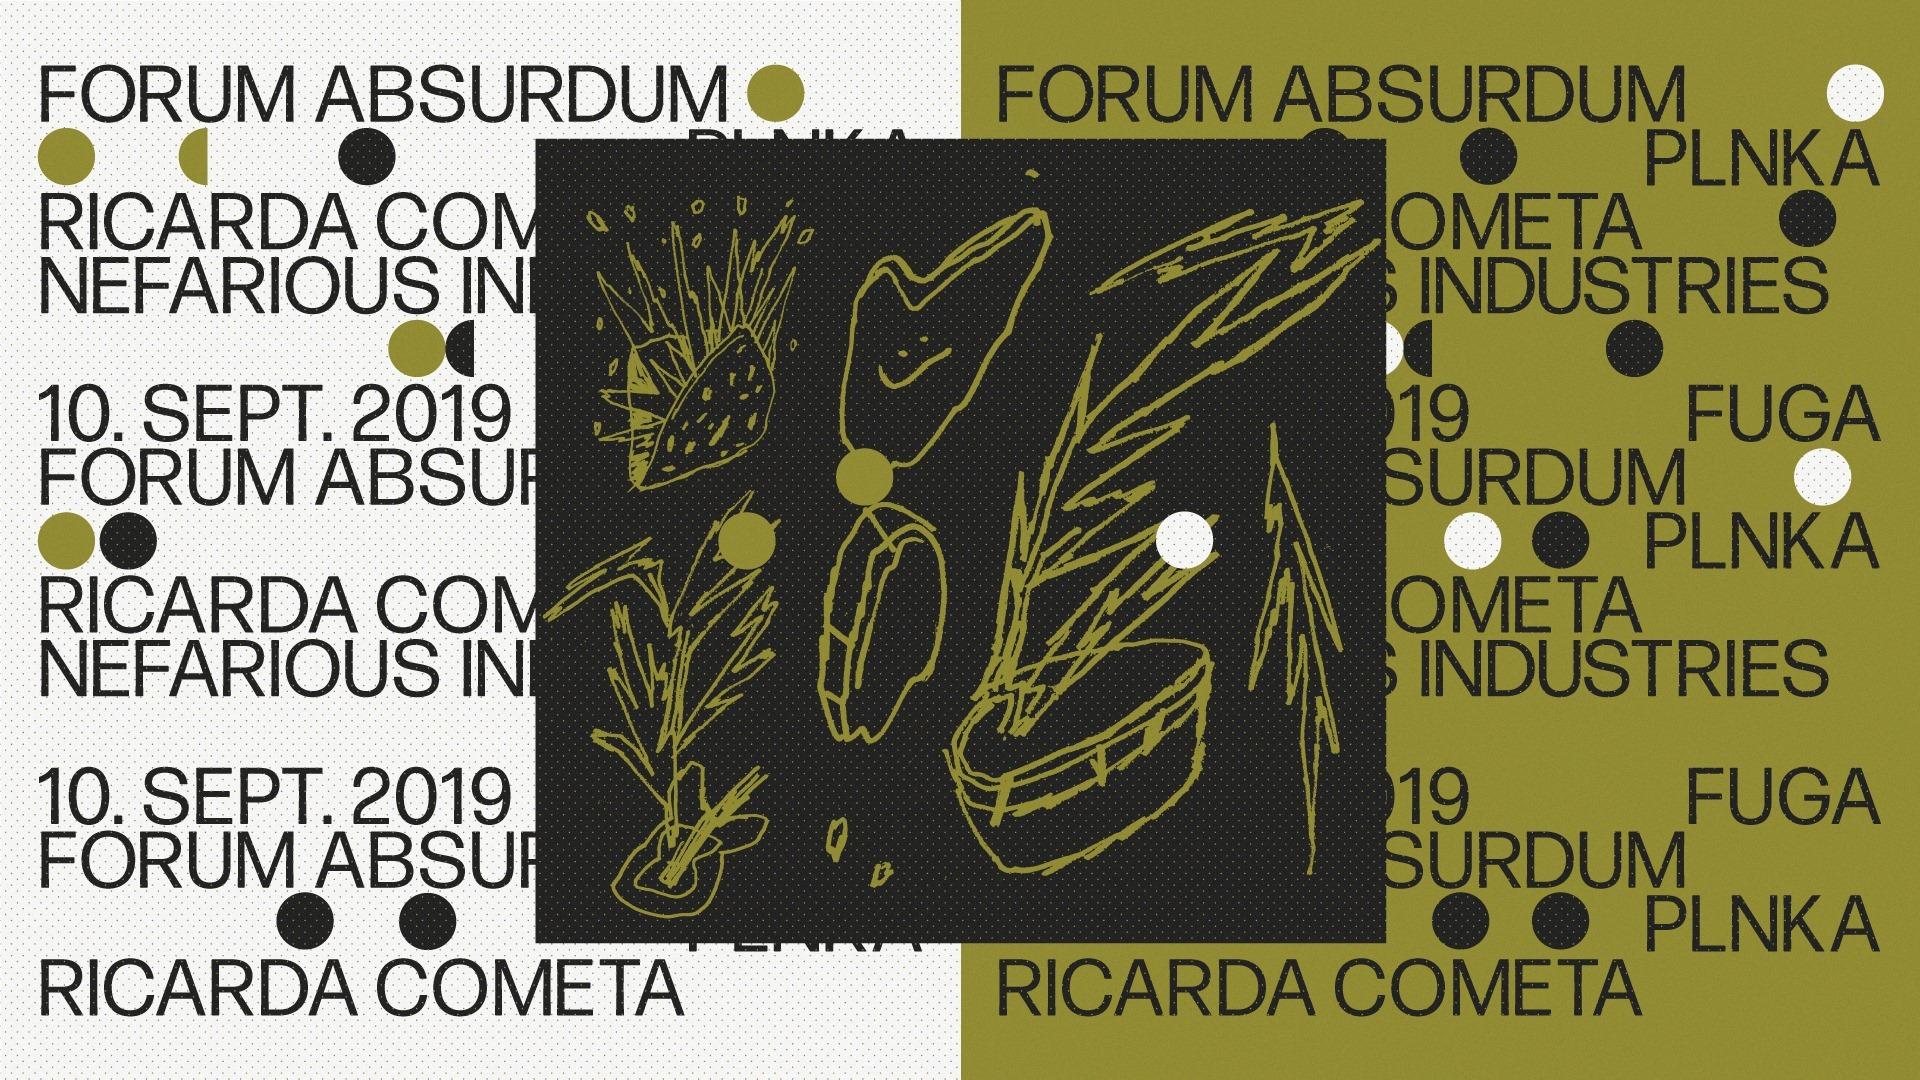 Ricarda Cometa and Urbanfailure